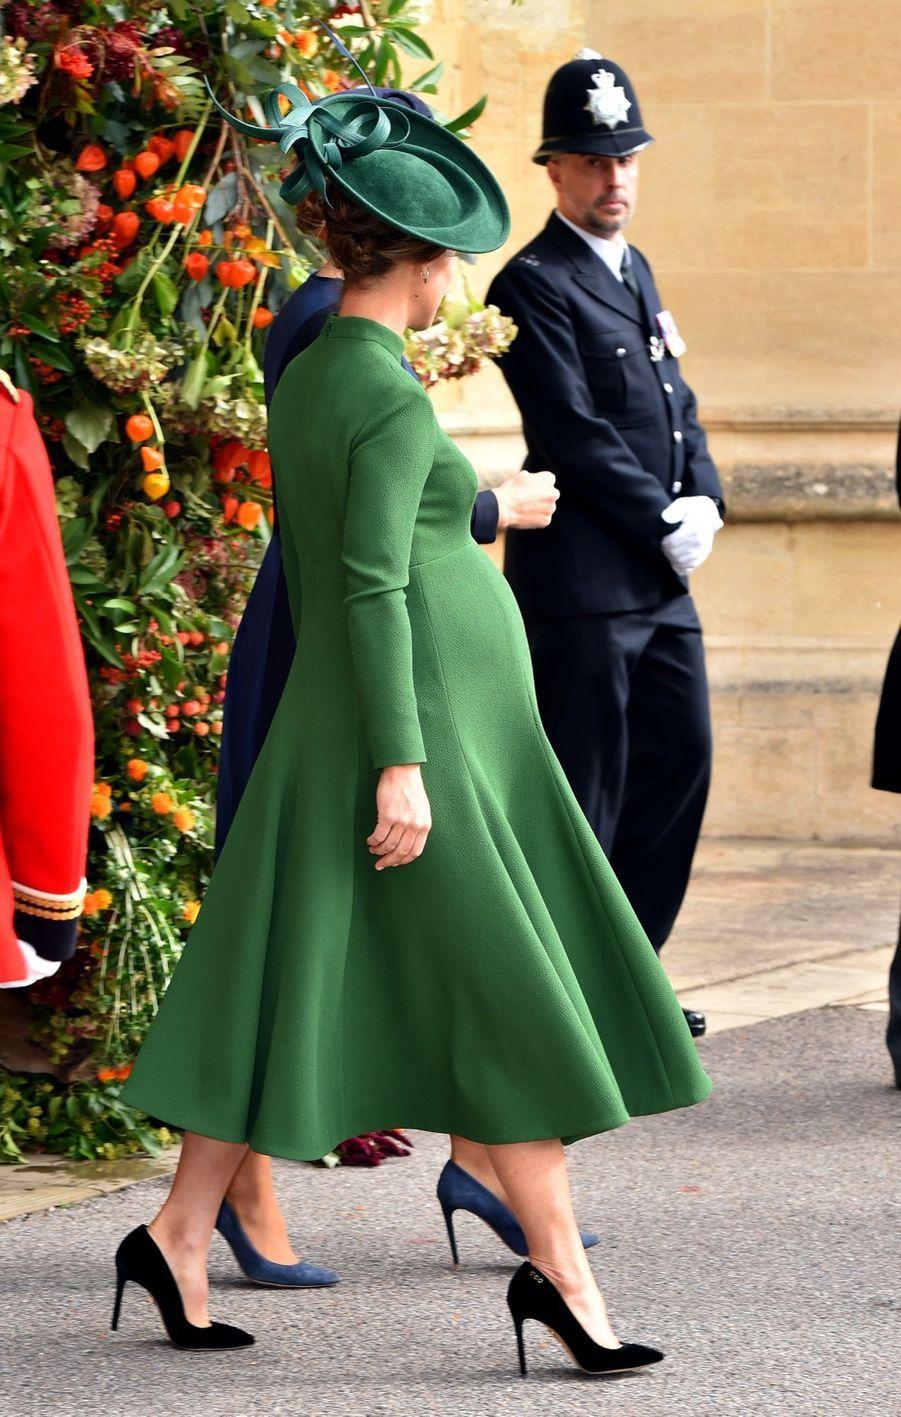 Pippa Middleton Très Enceinte Au Mariage De La Princesse Eugenie D'York ( 12